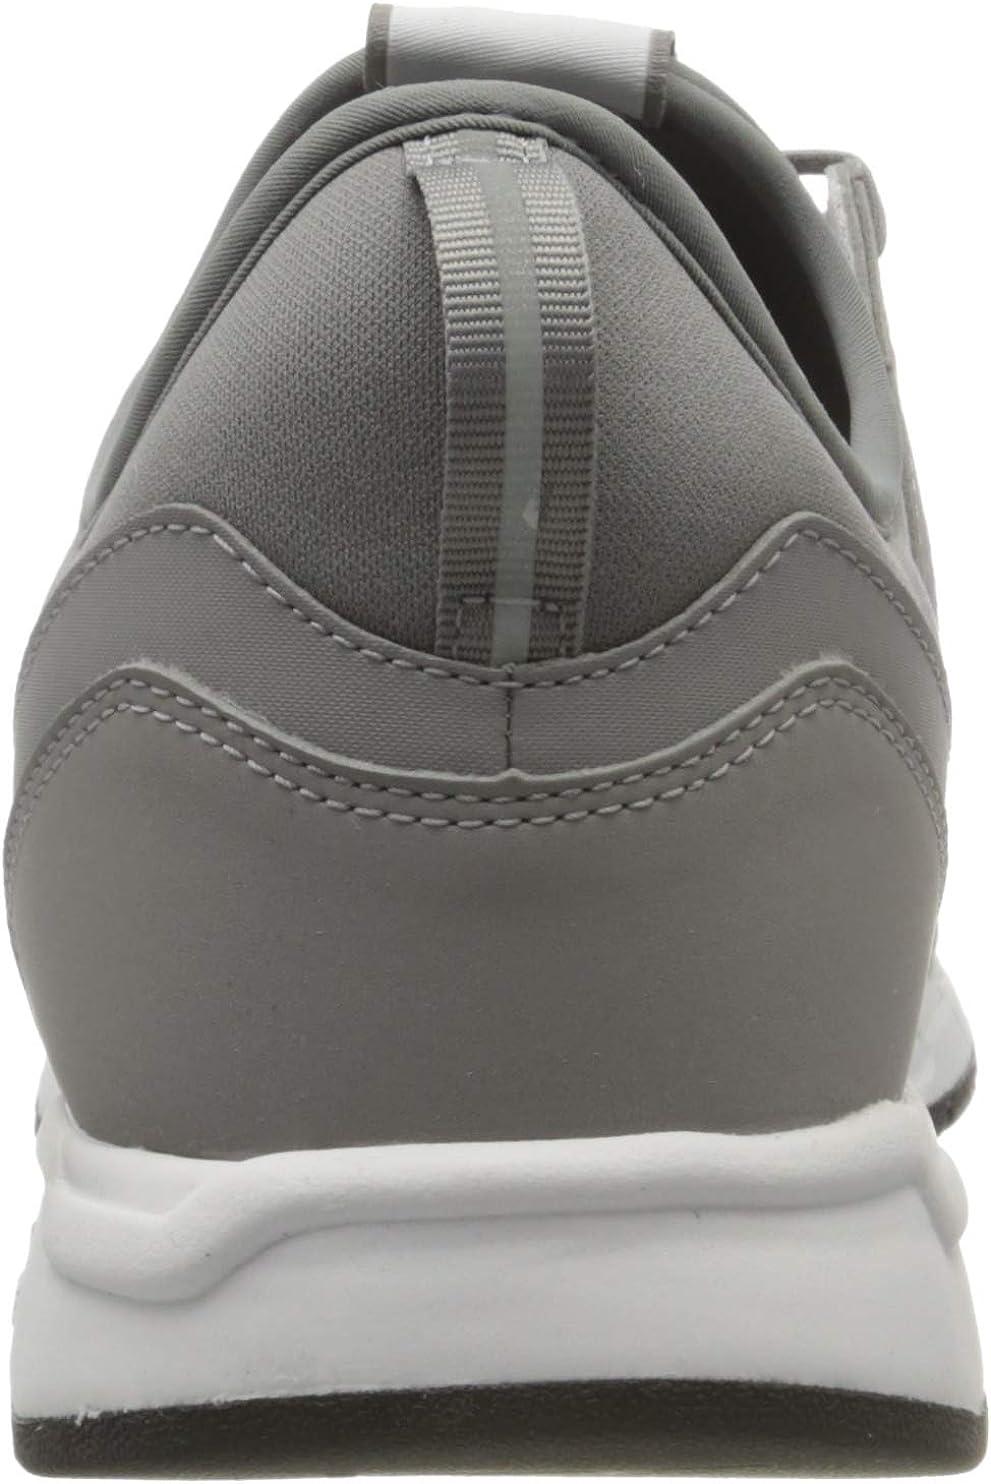 Amazon.com | New Balance Men's Mrl247 Classic | Fashion Sneakers